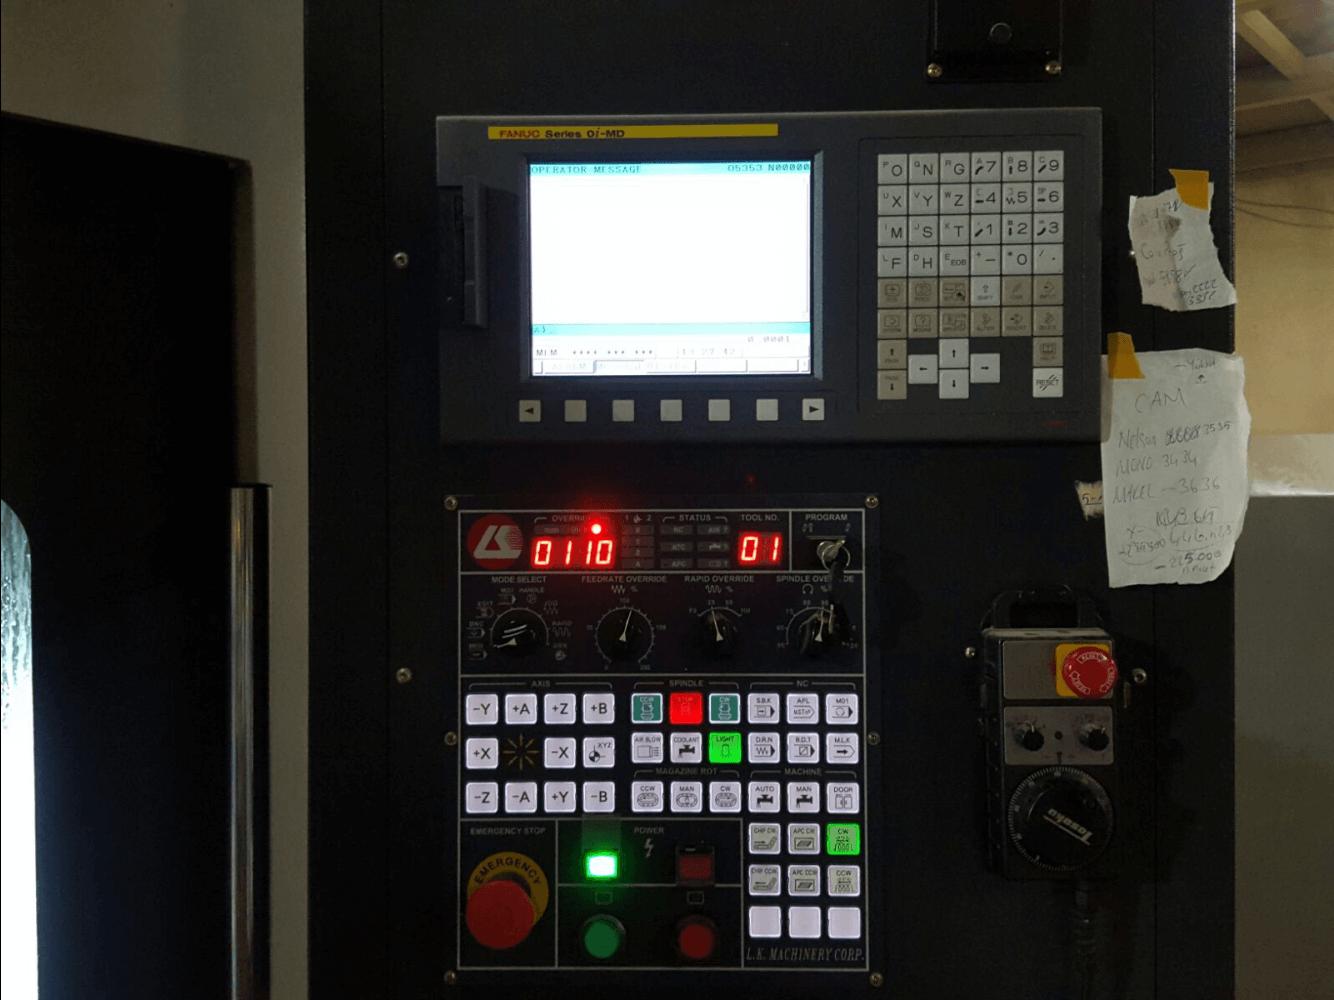 LK MT-800P ÇİFT TABLALI İŞLEME MERKEZİ